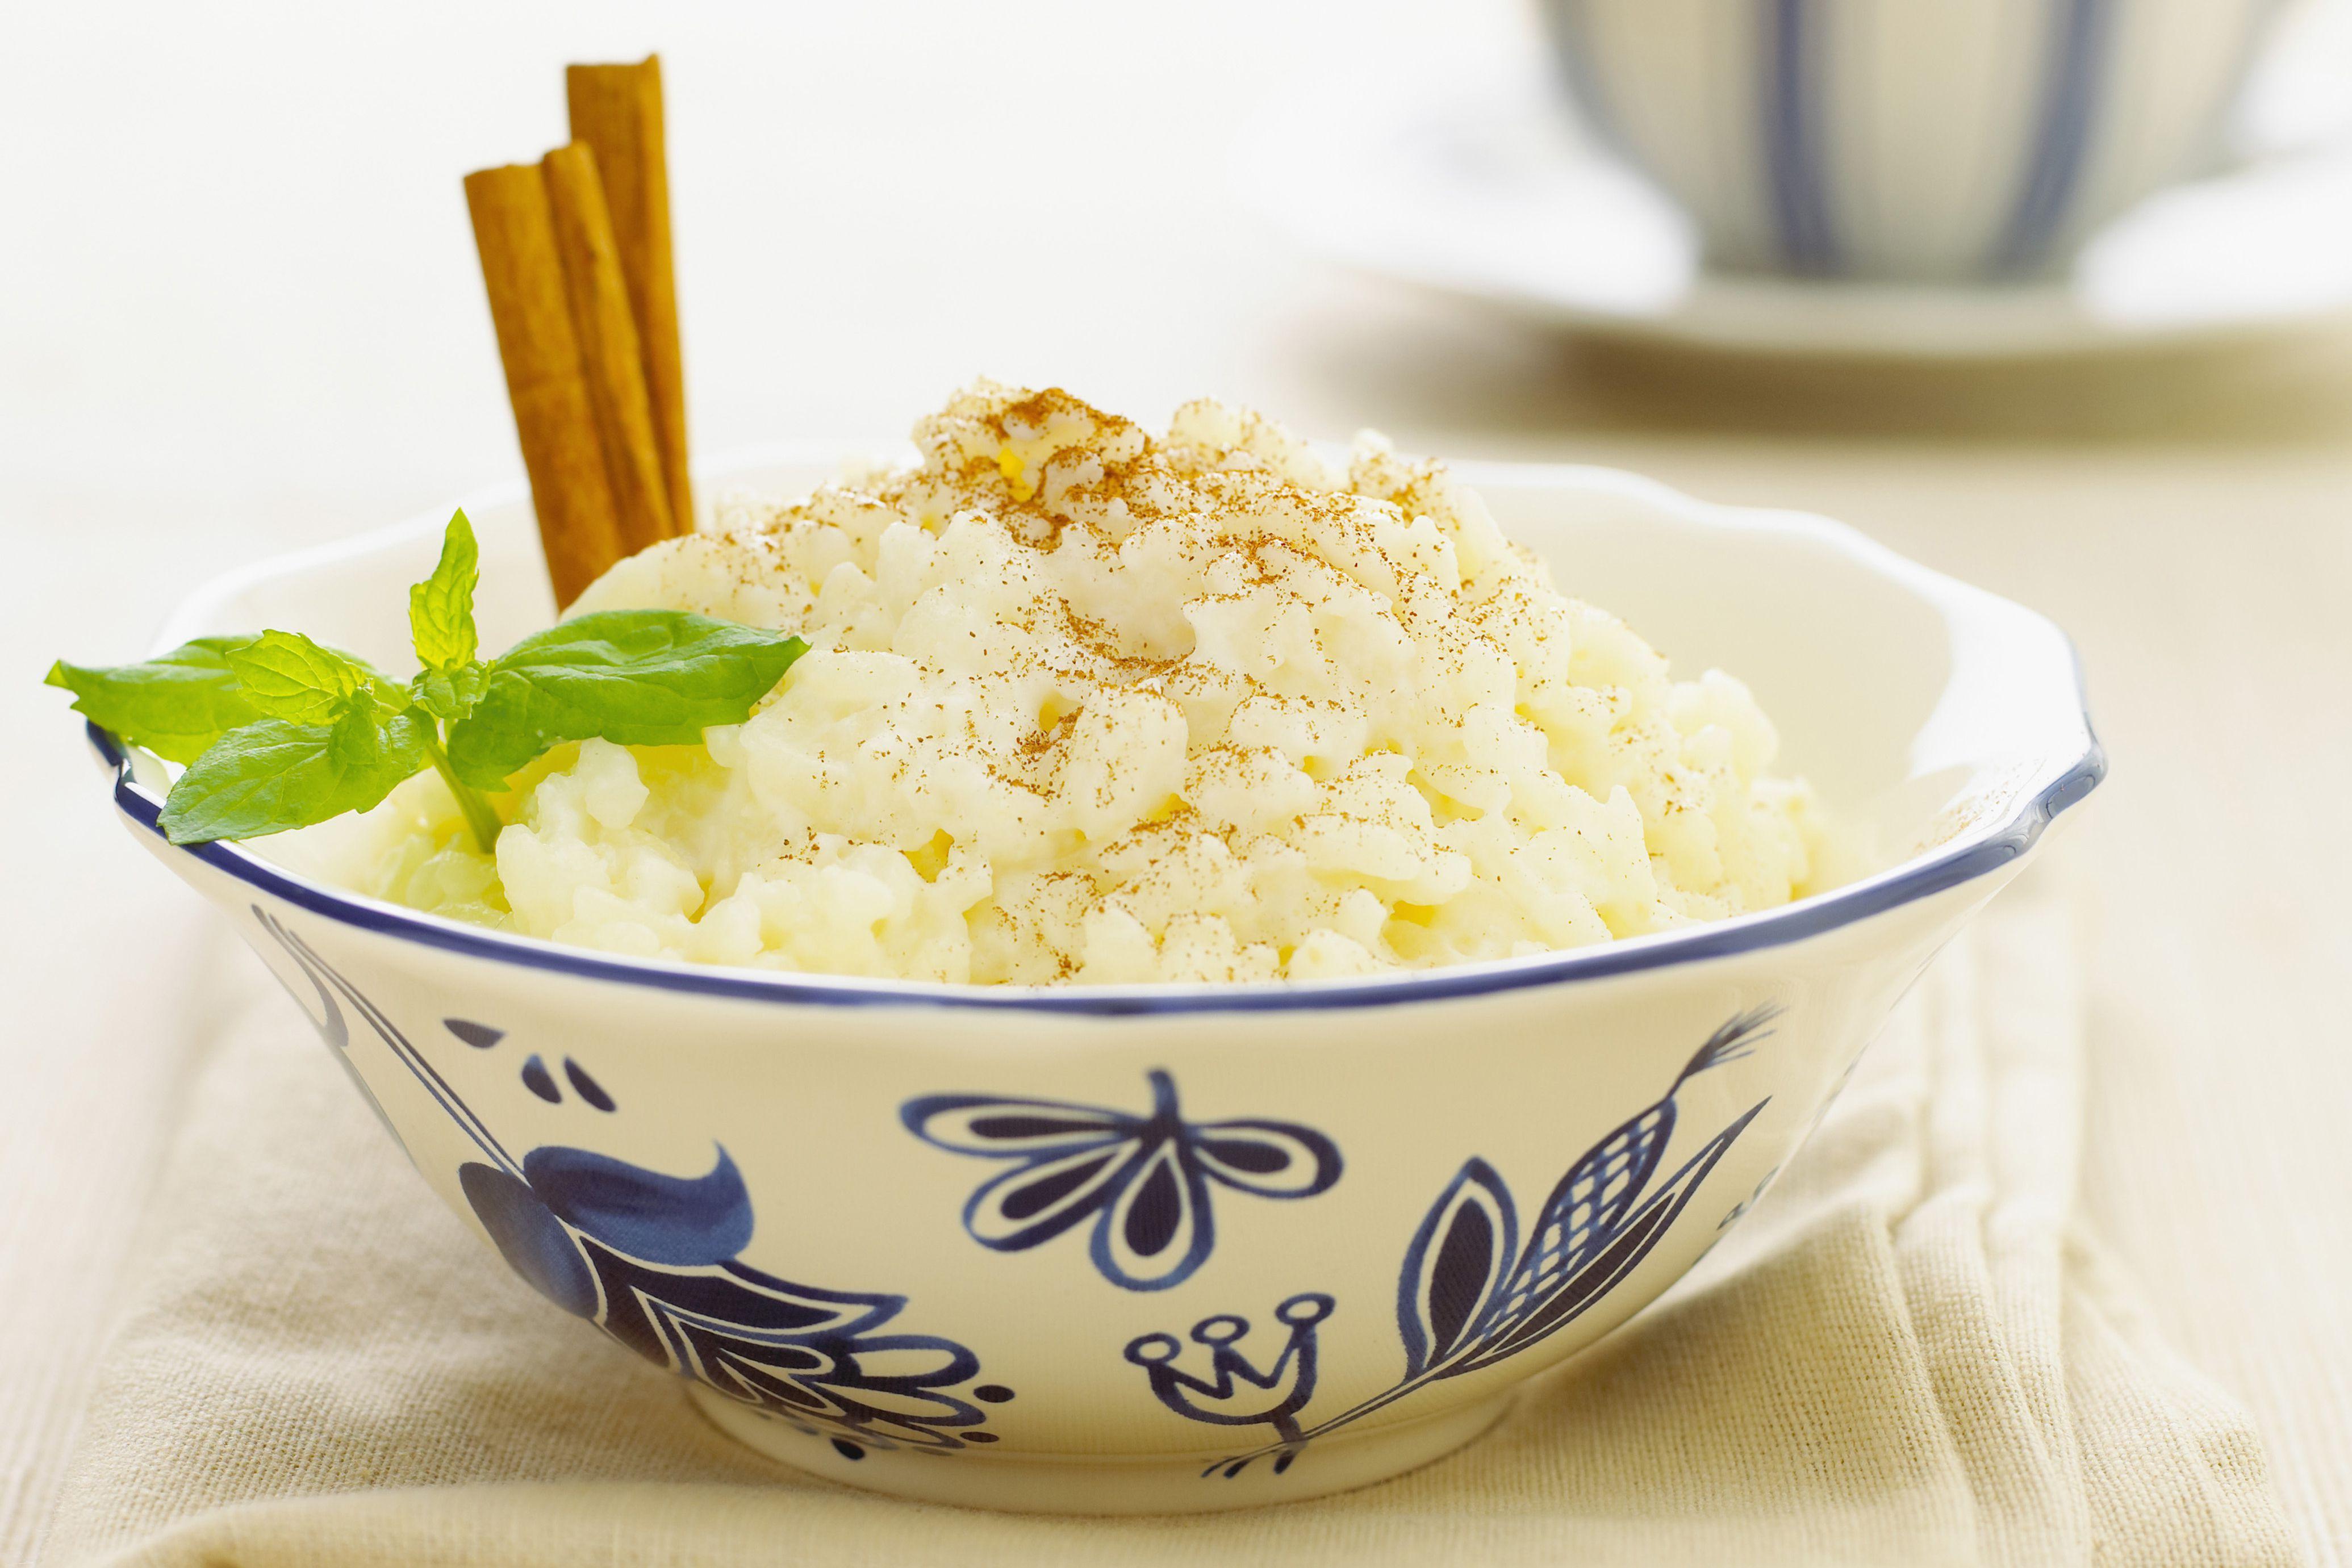 Old fashioned southern rice pudding recipe Alfa Romeo Cars, Convertible, Coupe, Sedan, SUV/Crossover